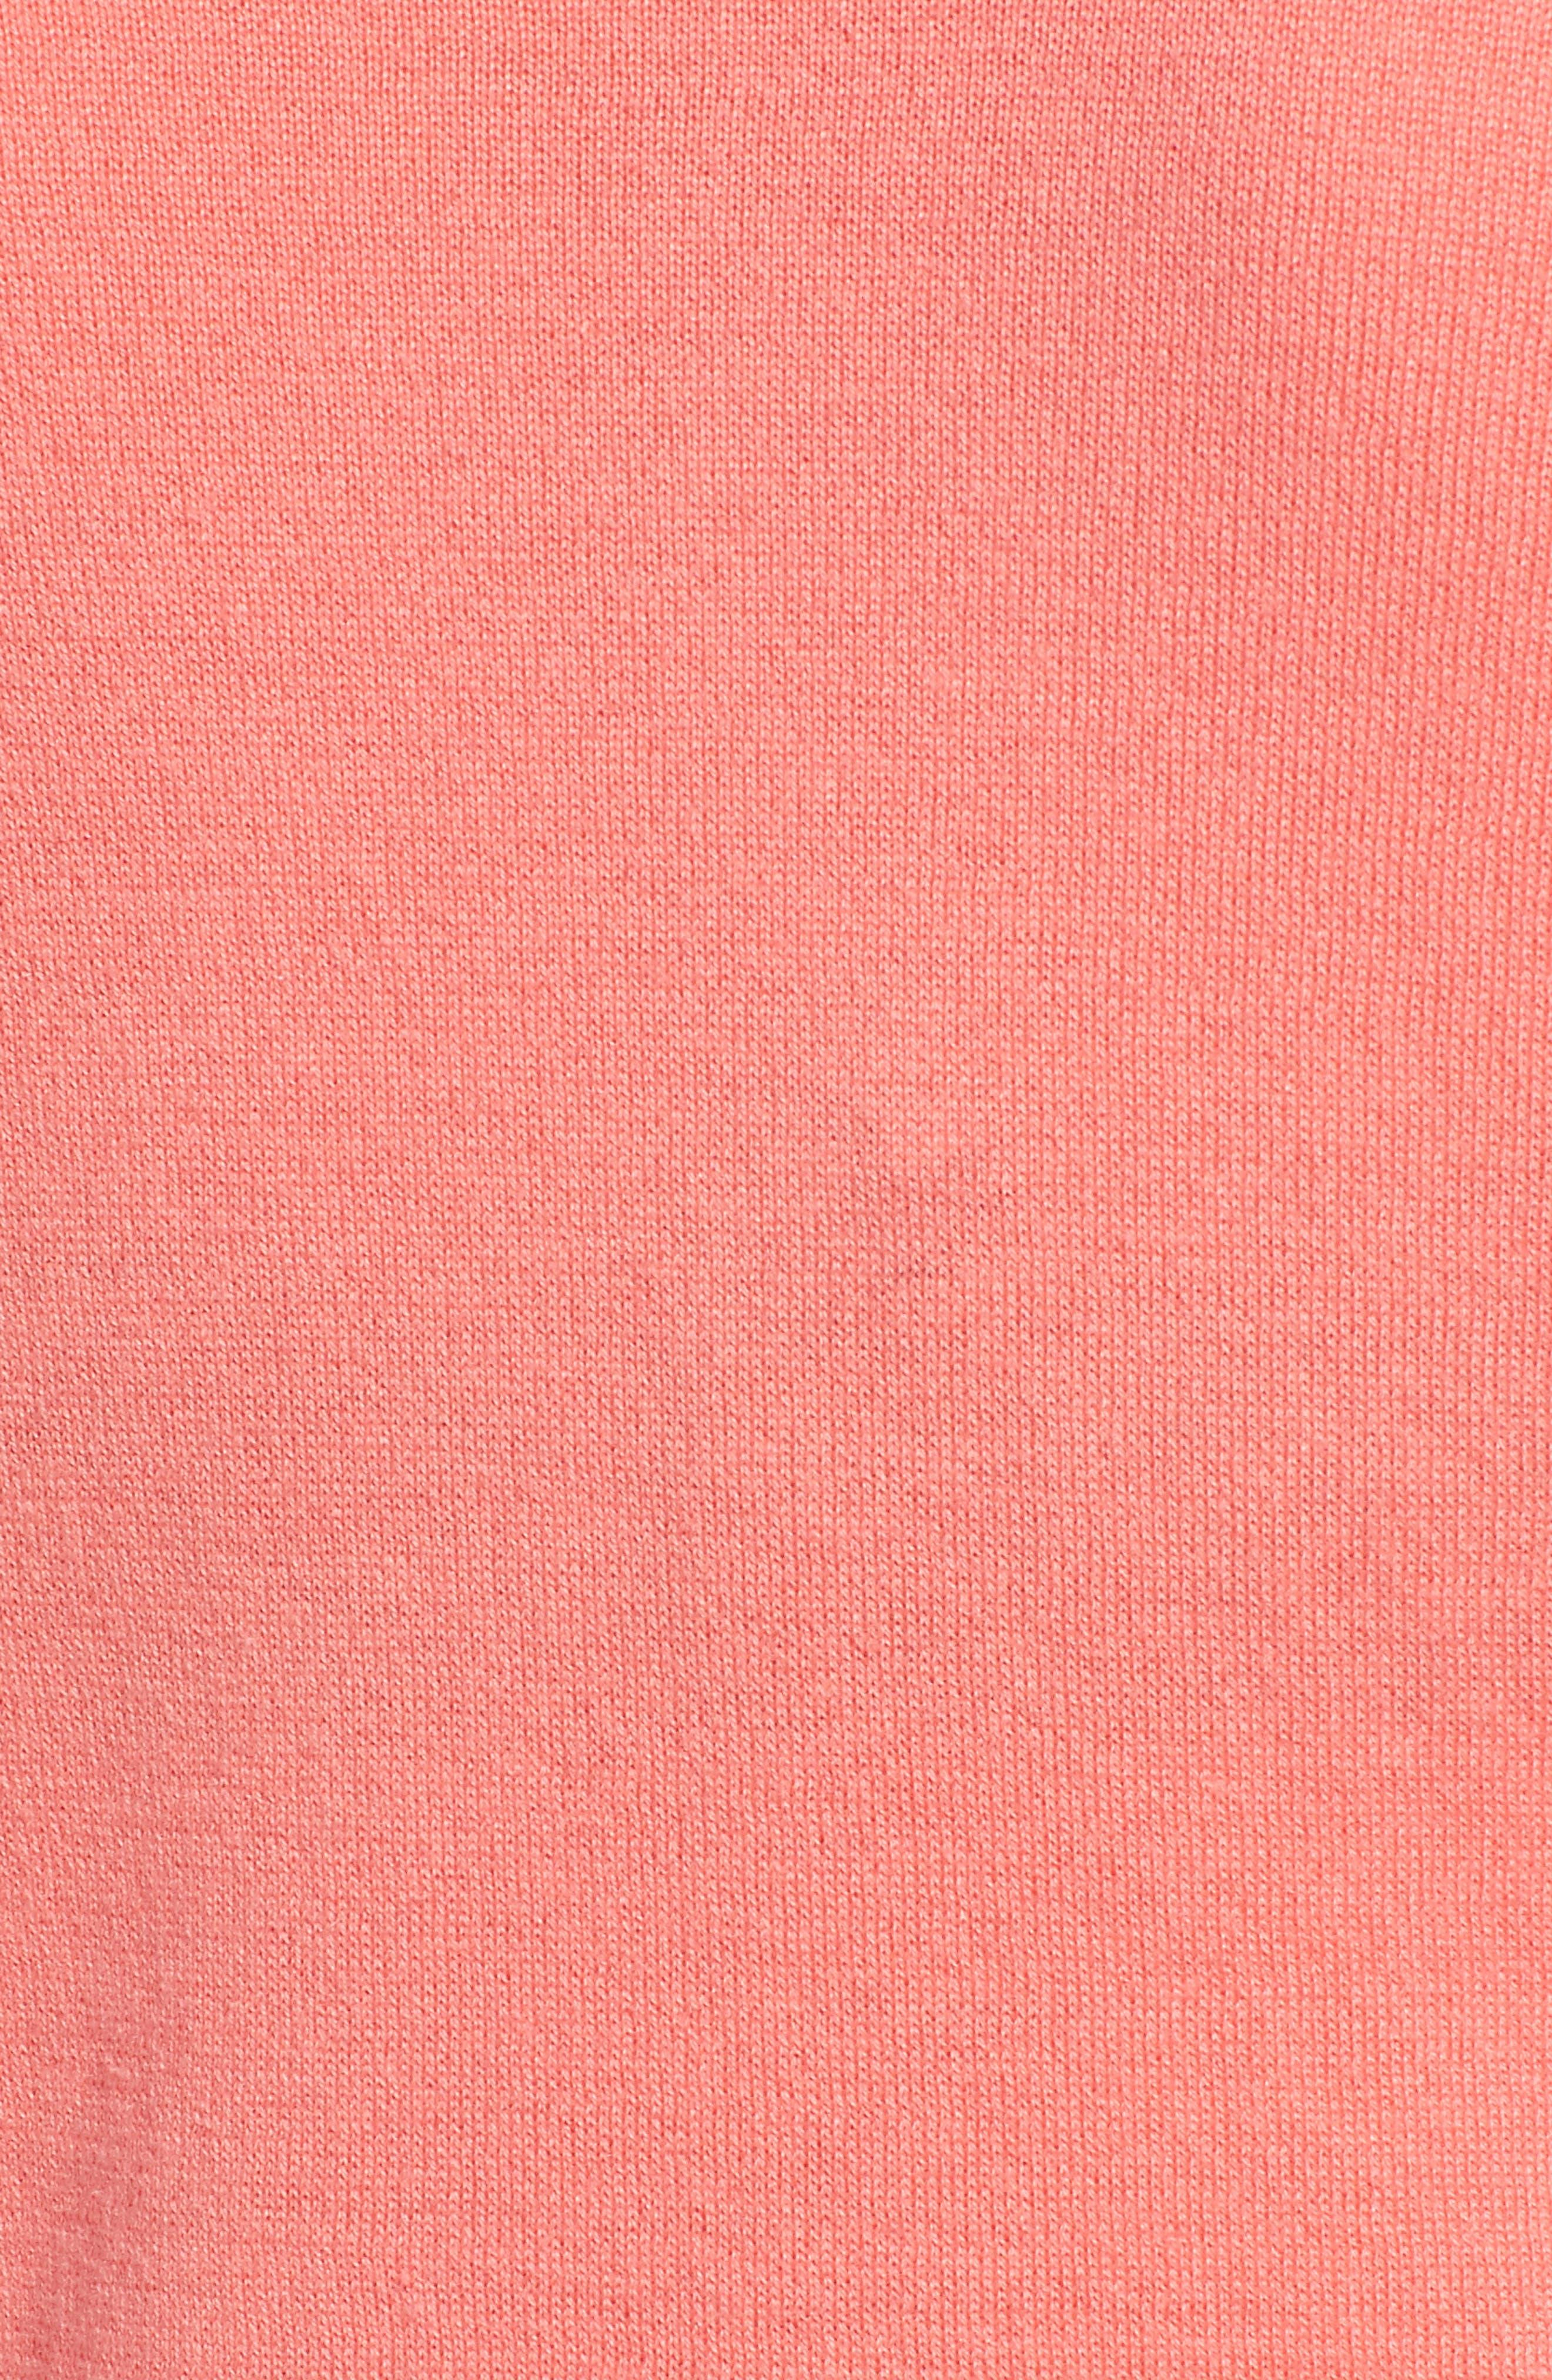 Cotton Blend Pullover,                             Alternate thumbnail 127, color,